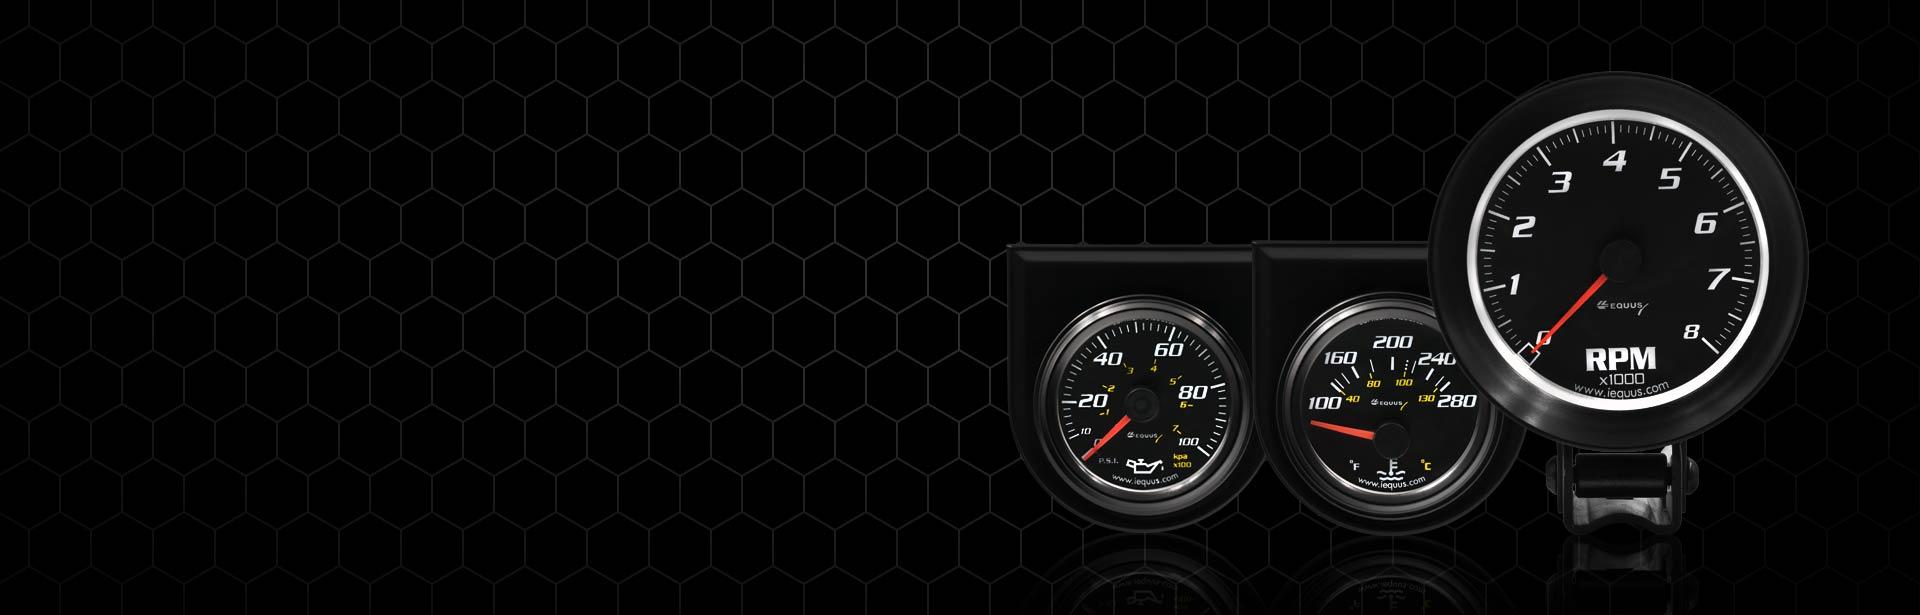 Iequus Replacement Tachometers Speedometers And Gauge Kits Equus Tachometer Wiring Diagram Slide 2